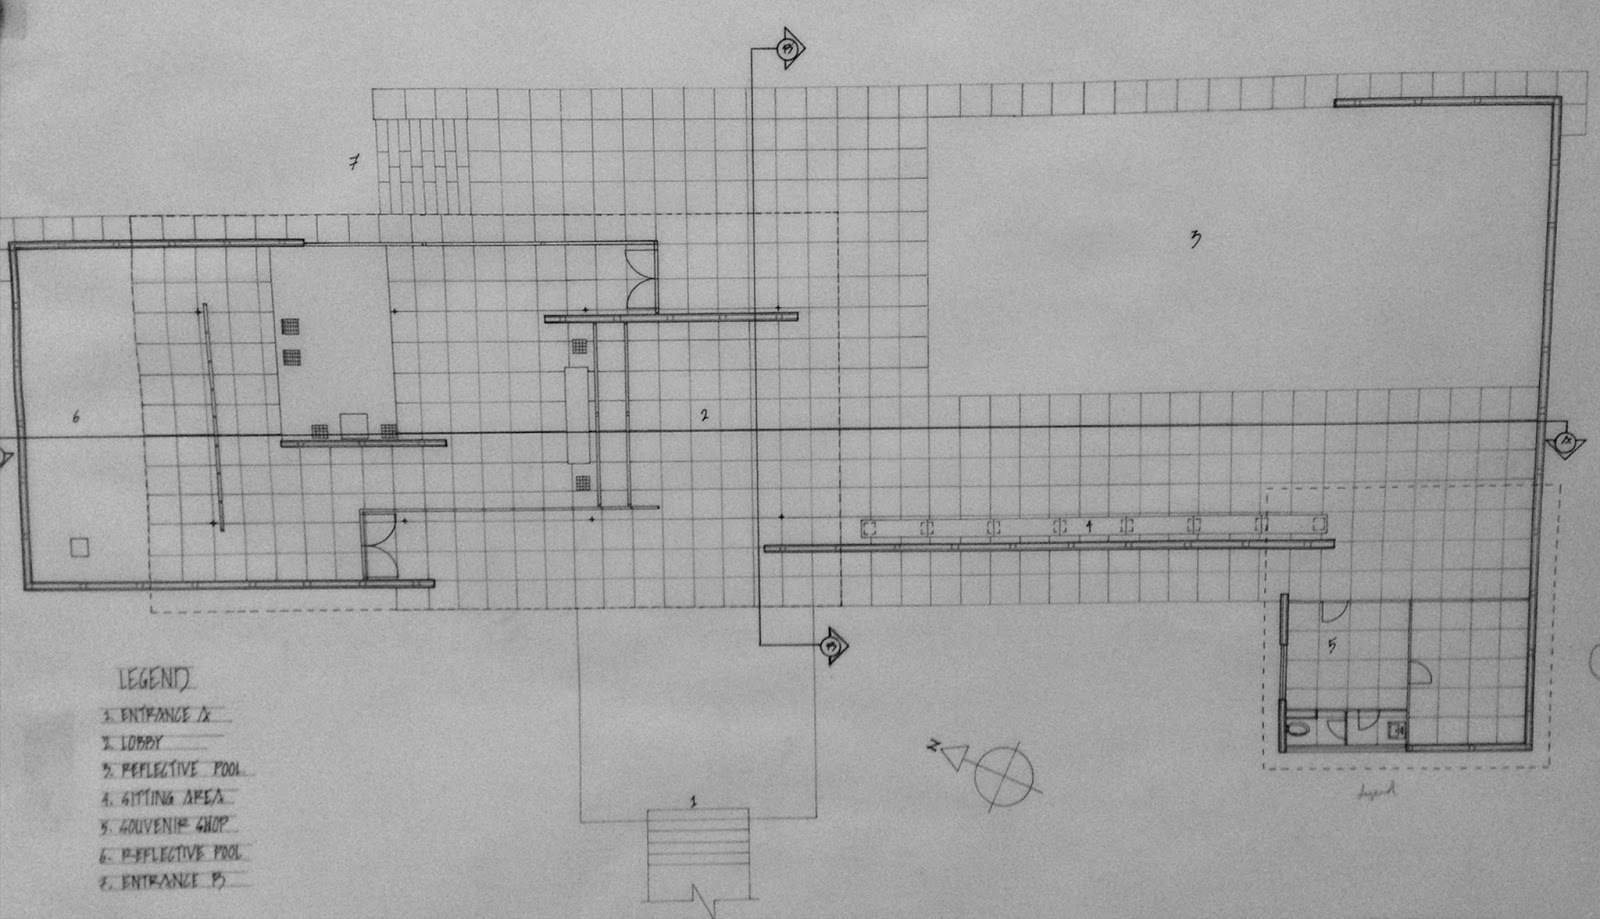 barcelona pavilion floor plan dimensions viewing gallery barcelona pavilion floor plan dimensions galleryhip com